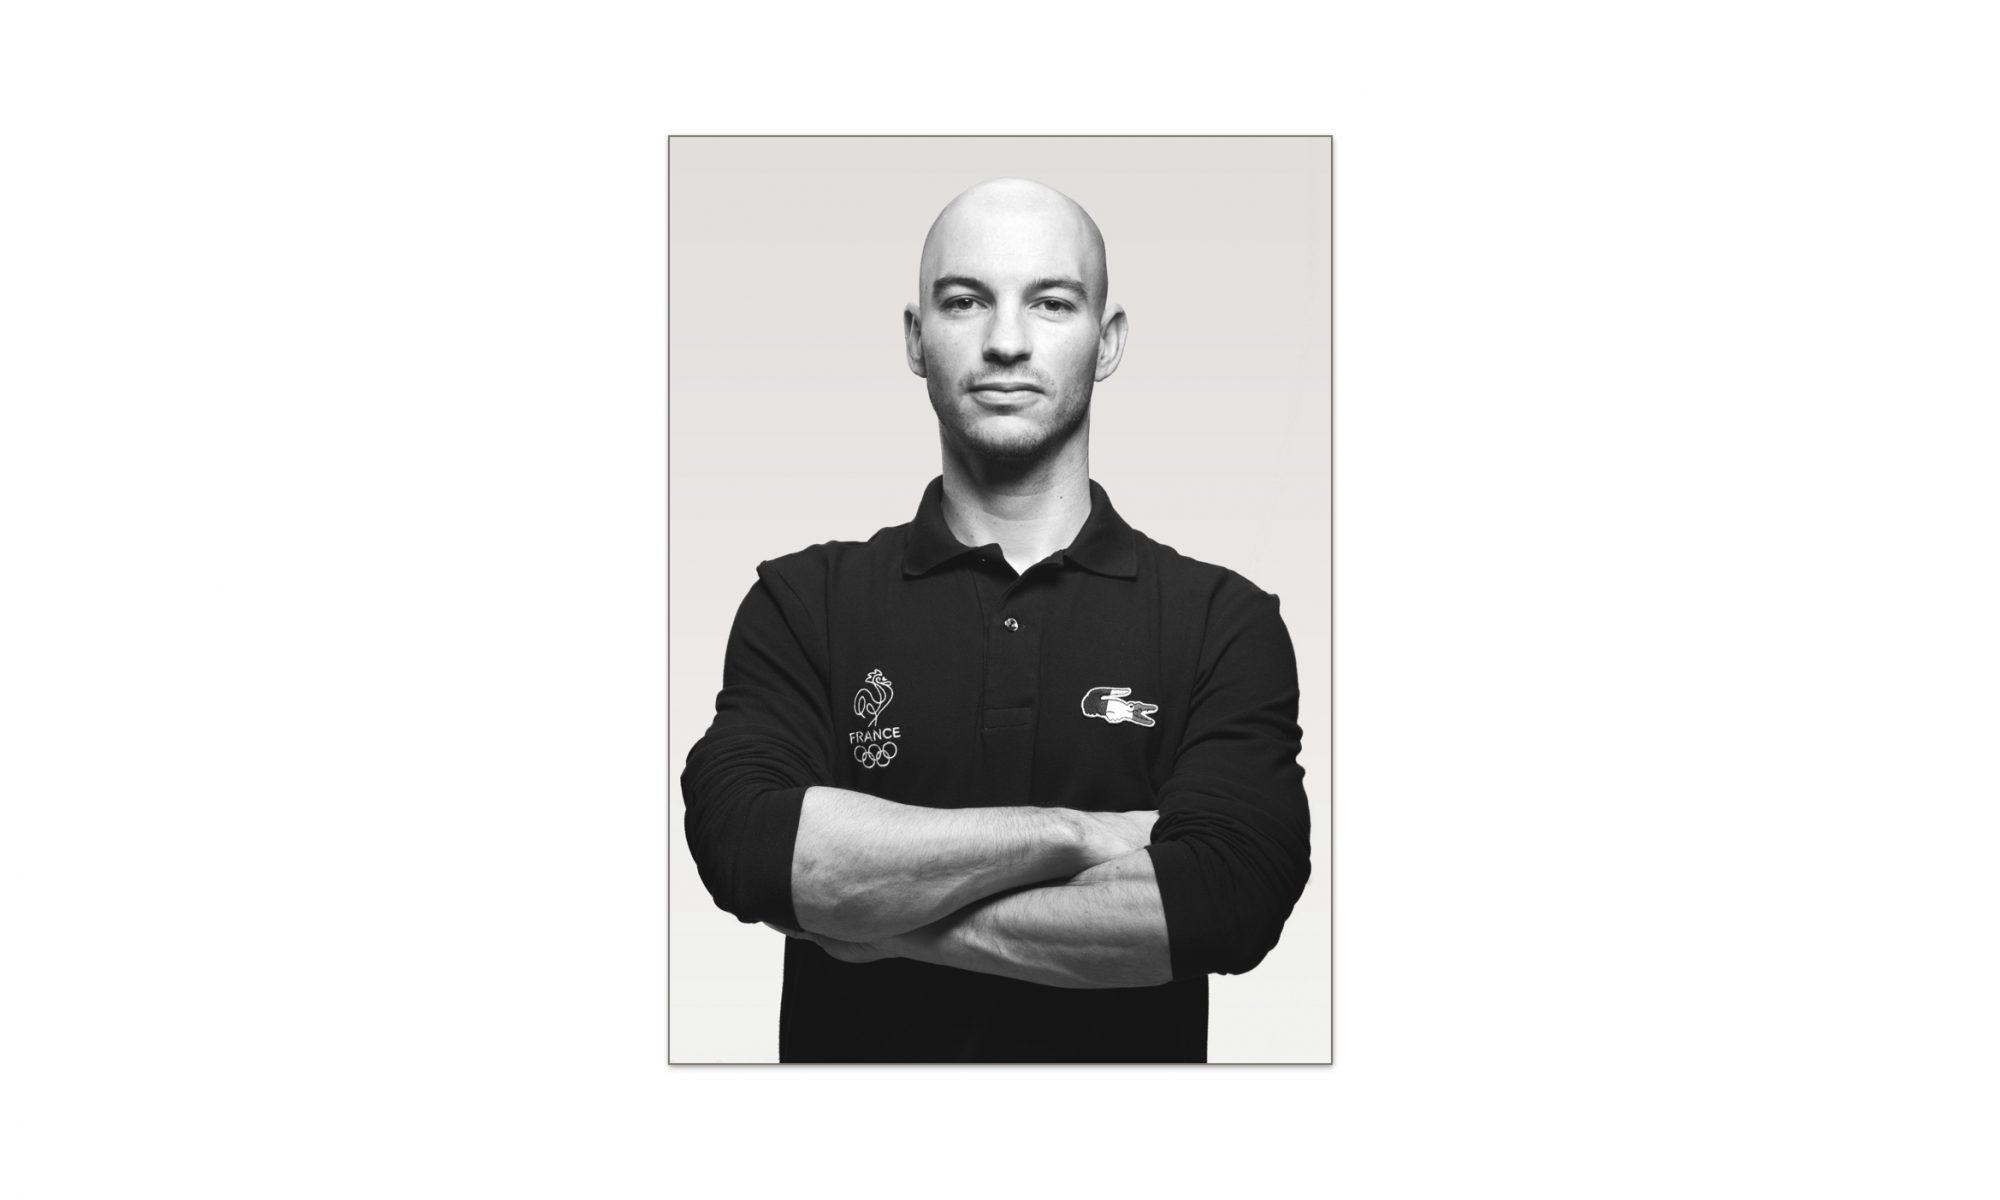 Romain Thomas France